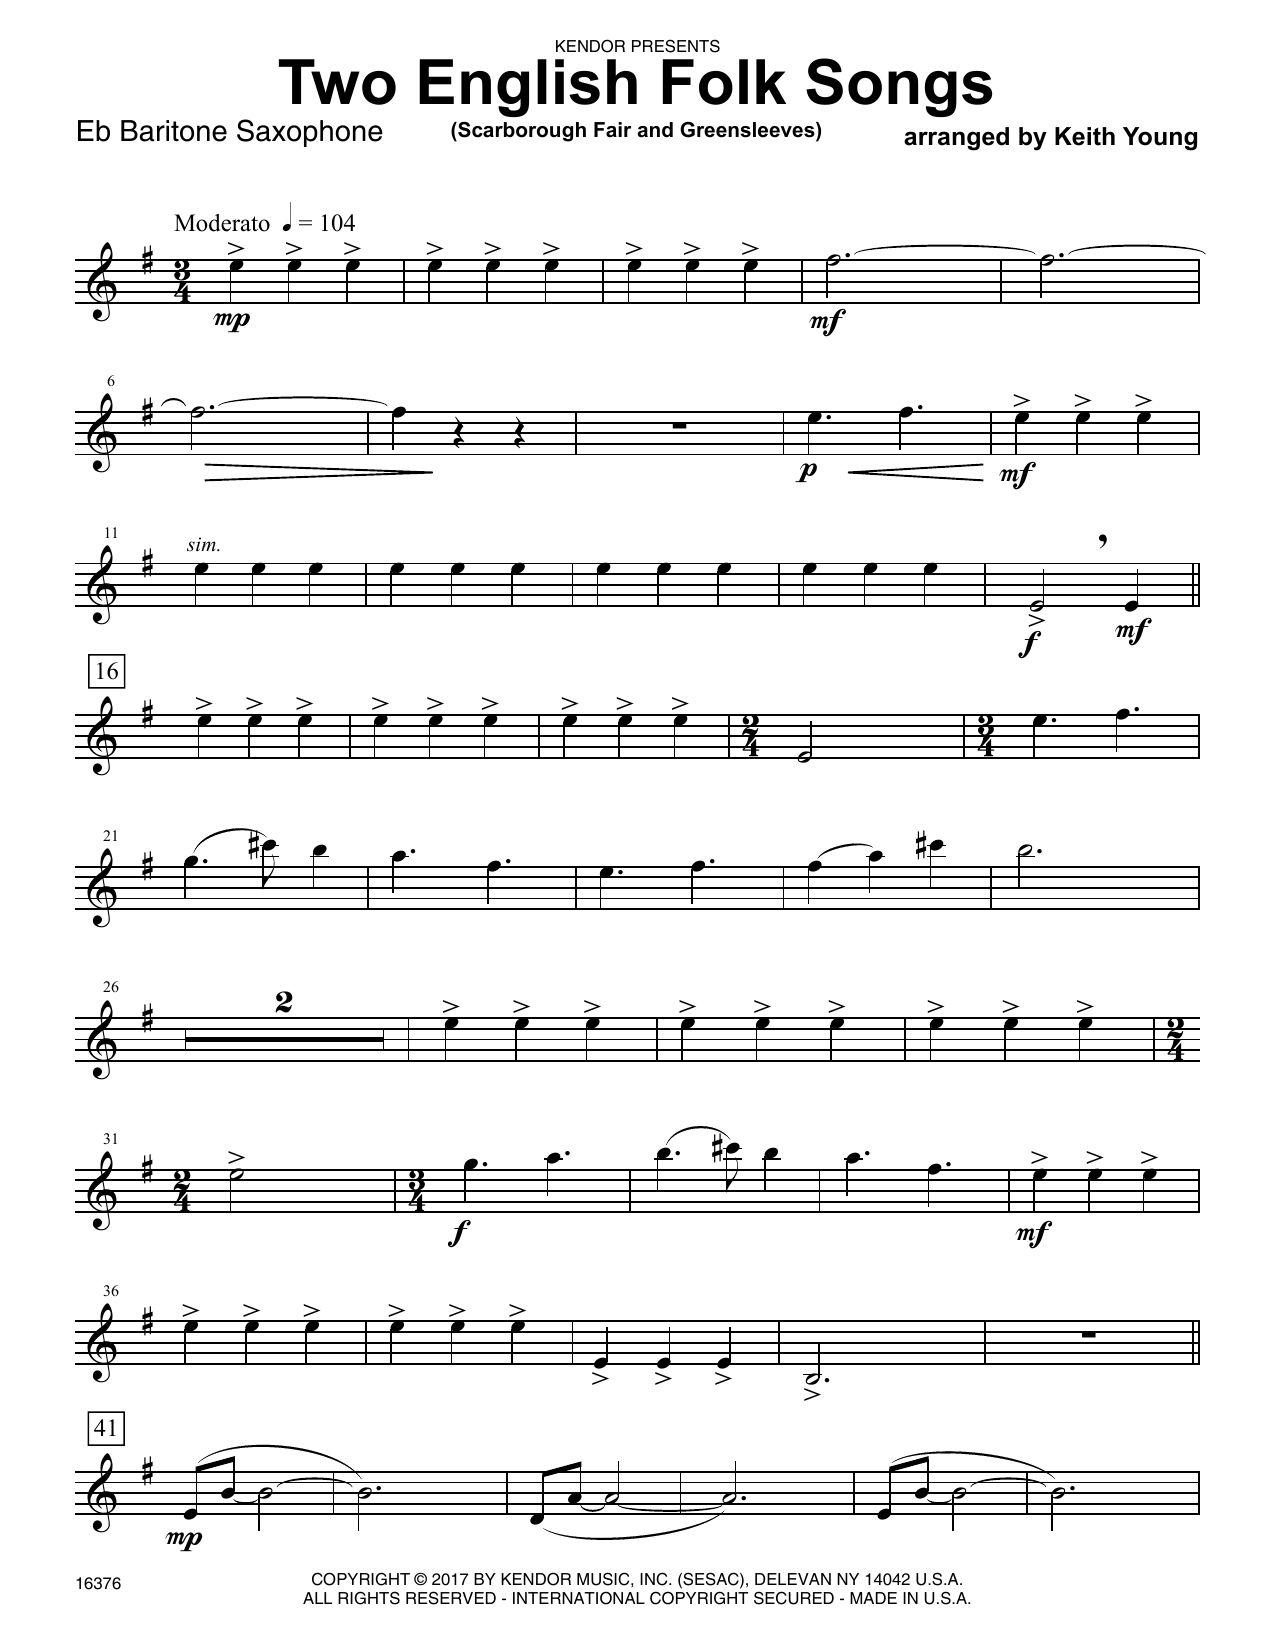 Two English Folk Songs (Scarborough Fair and Greensleeves) - Eb Baritone Saxophone Sheet Music